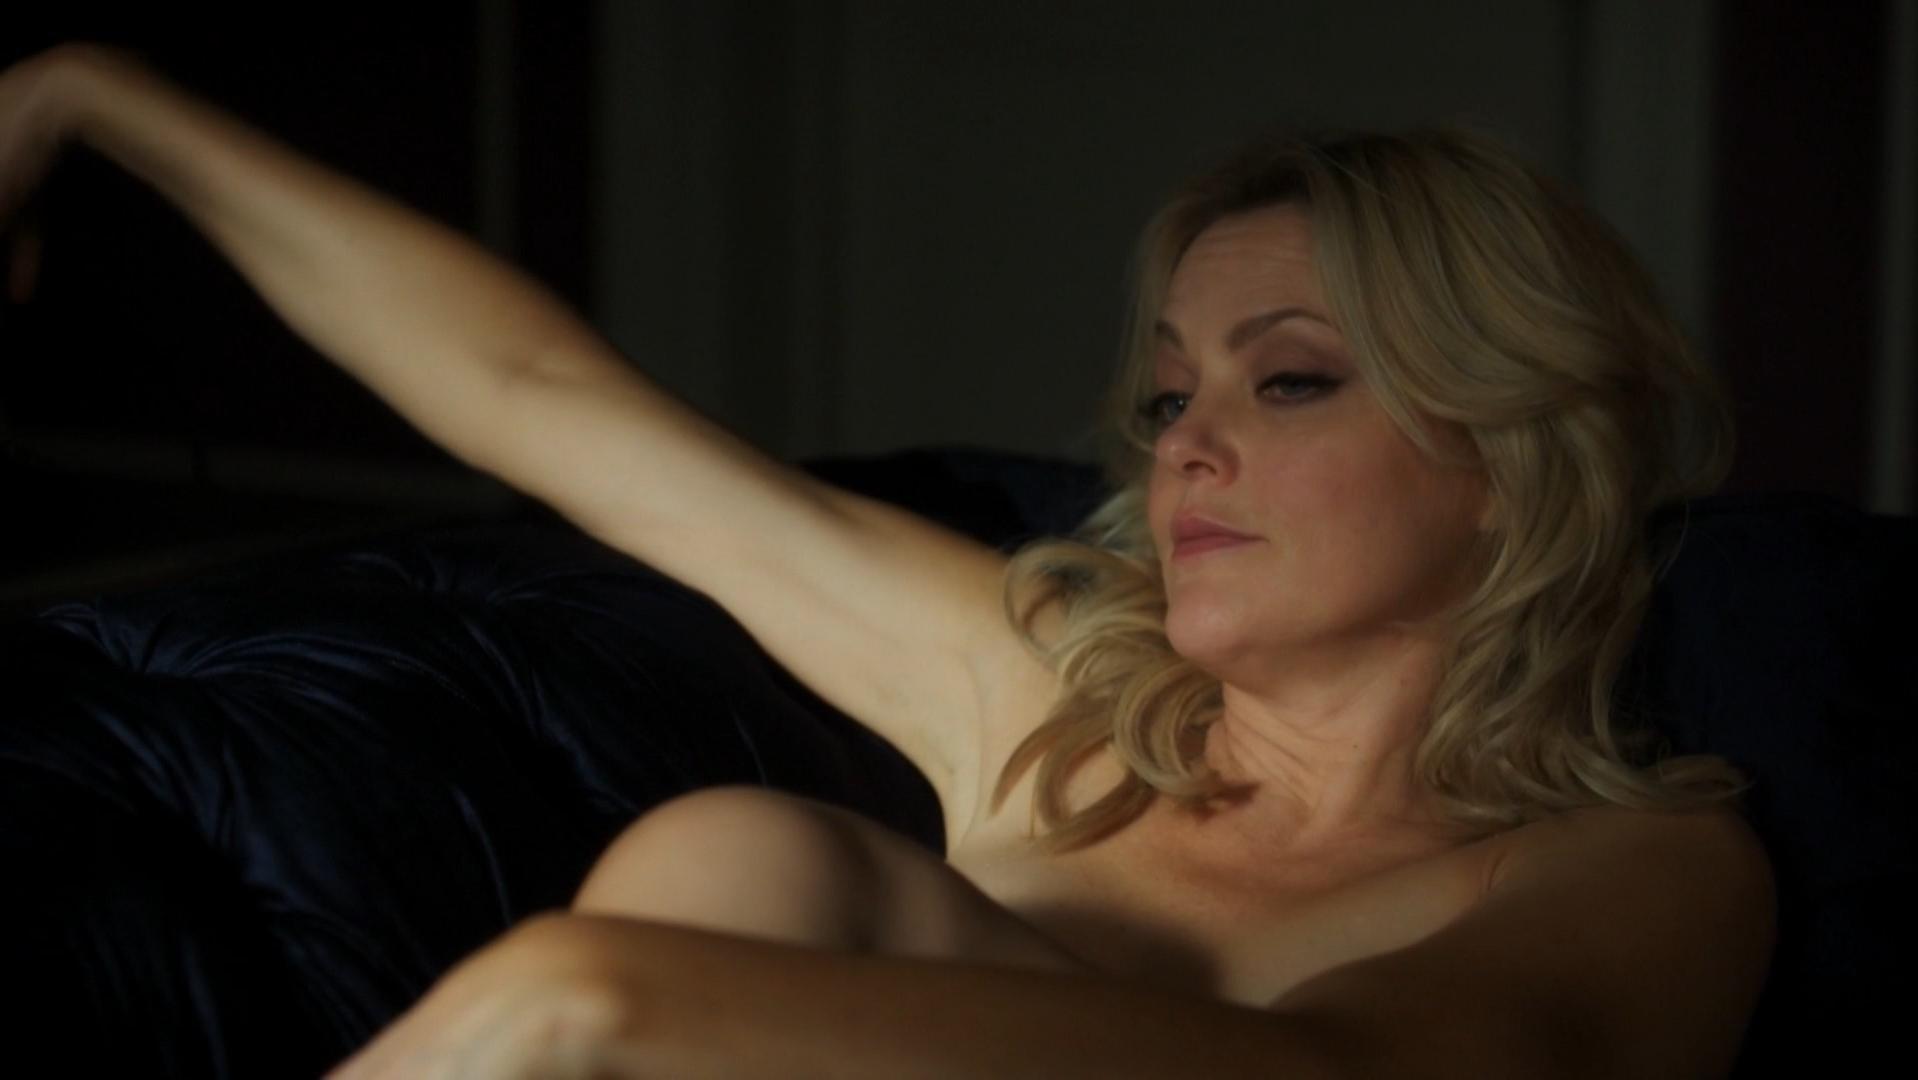 Elaine hendrix nude